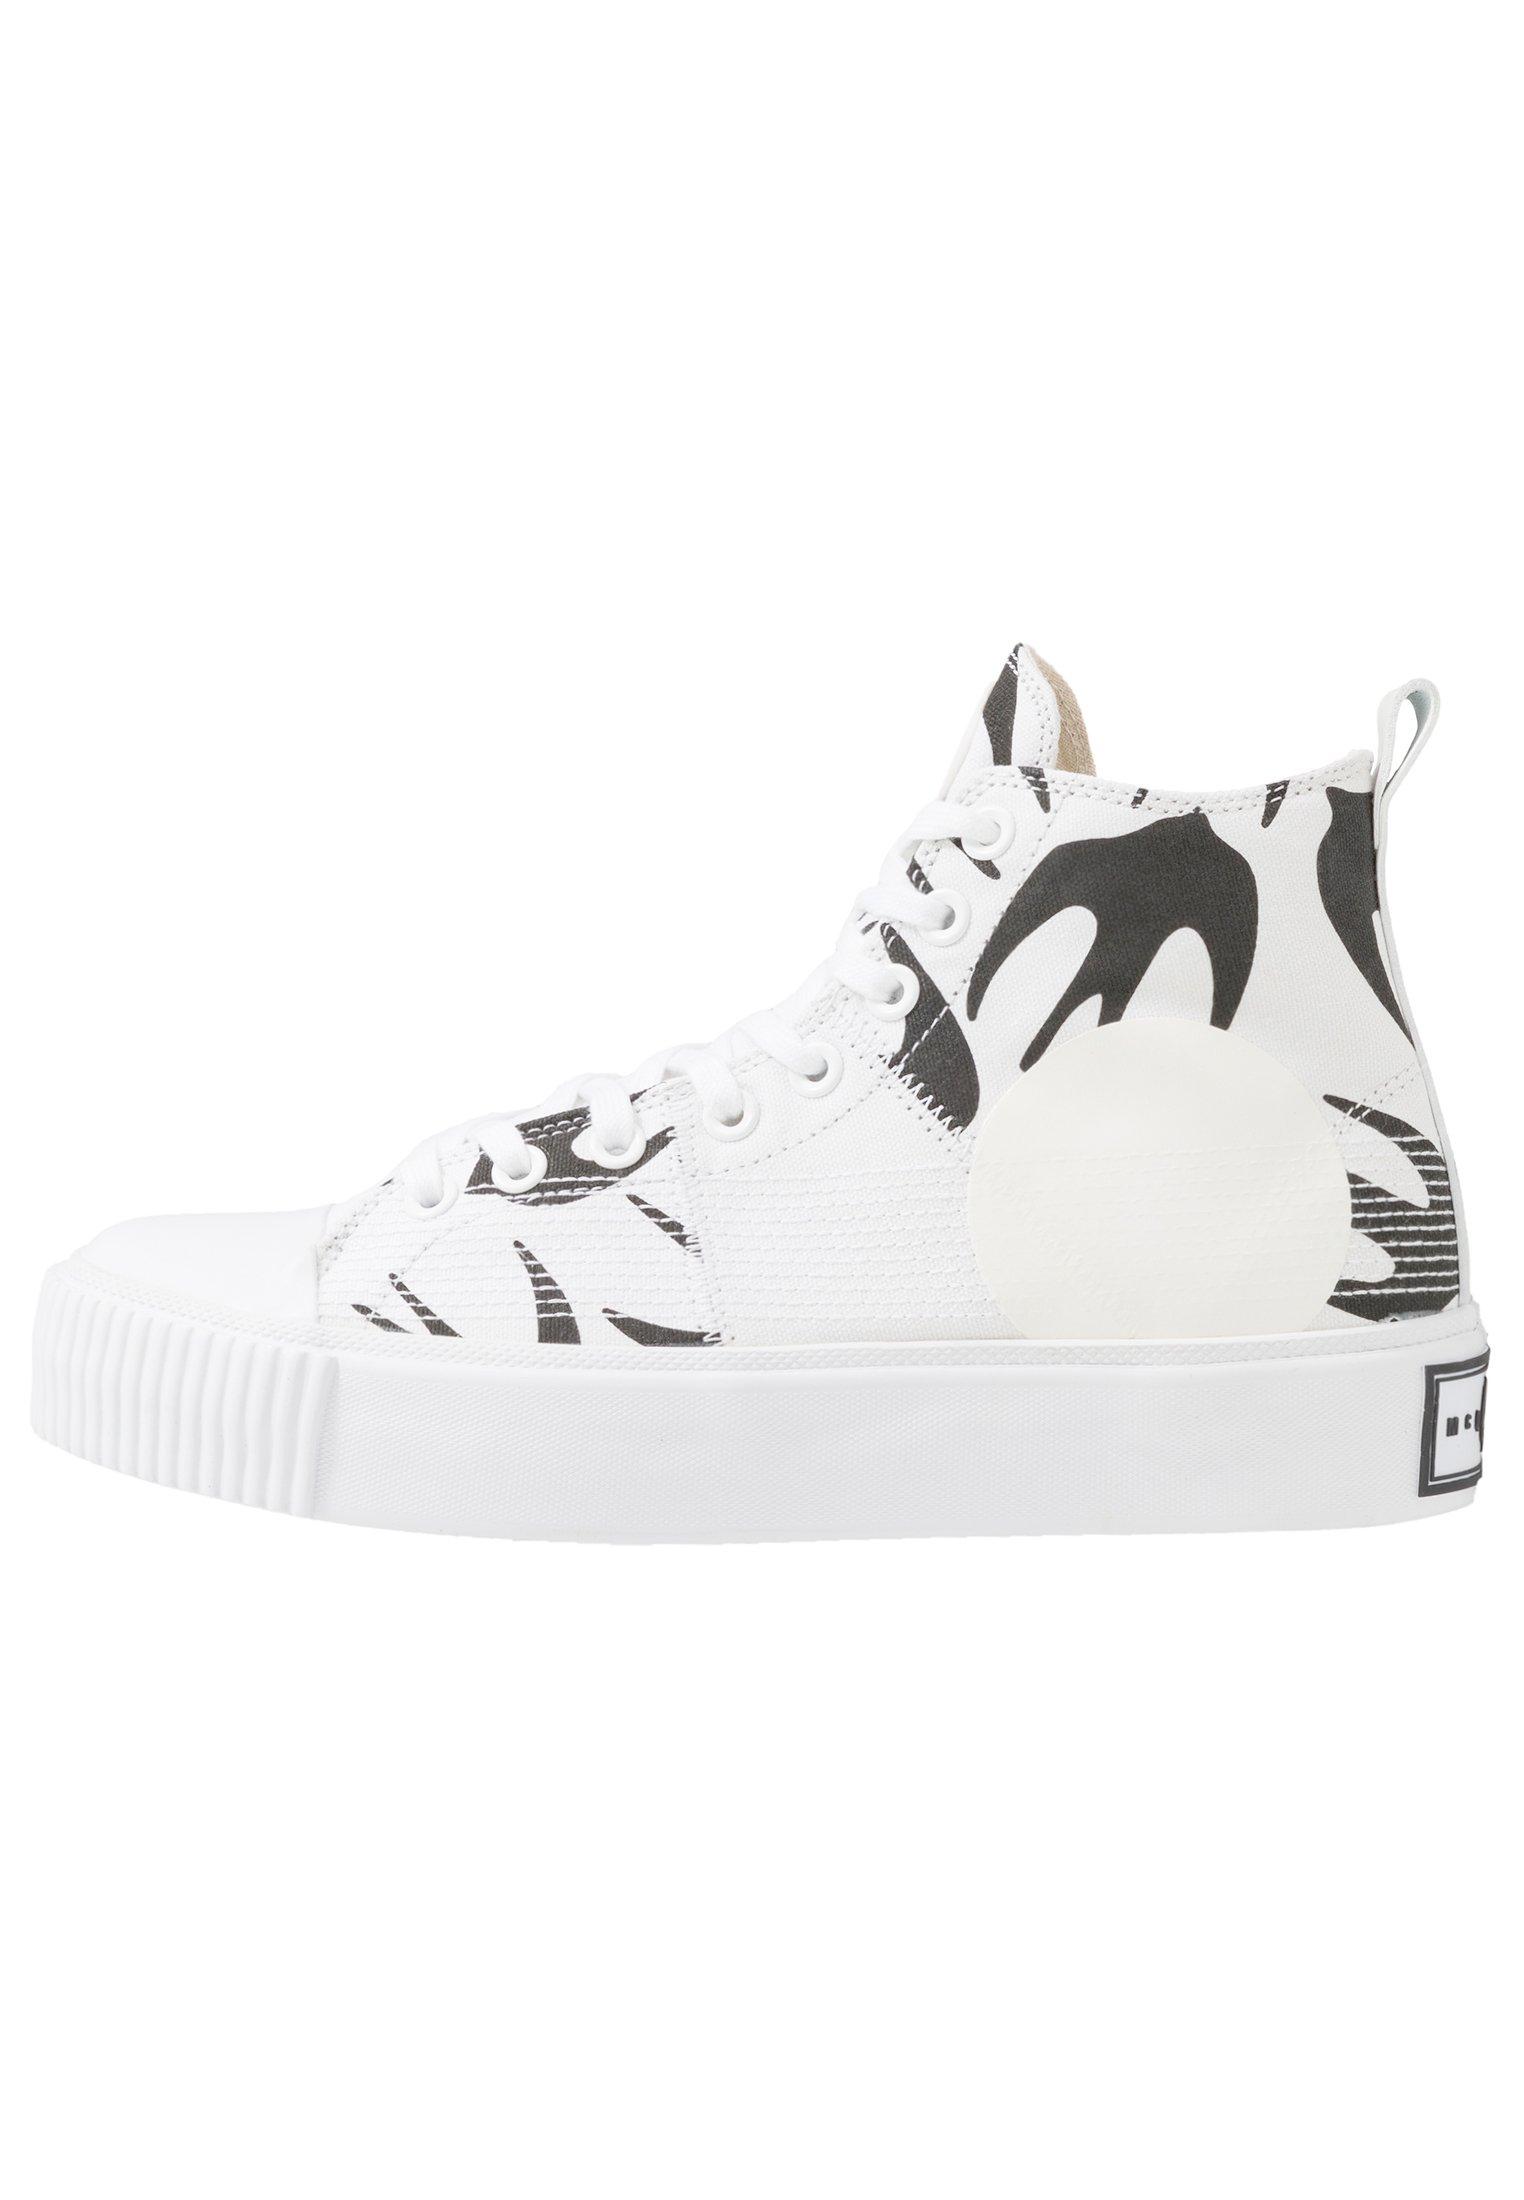 onitsuka tiger mexico 66 slip on black and white label en zalando